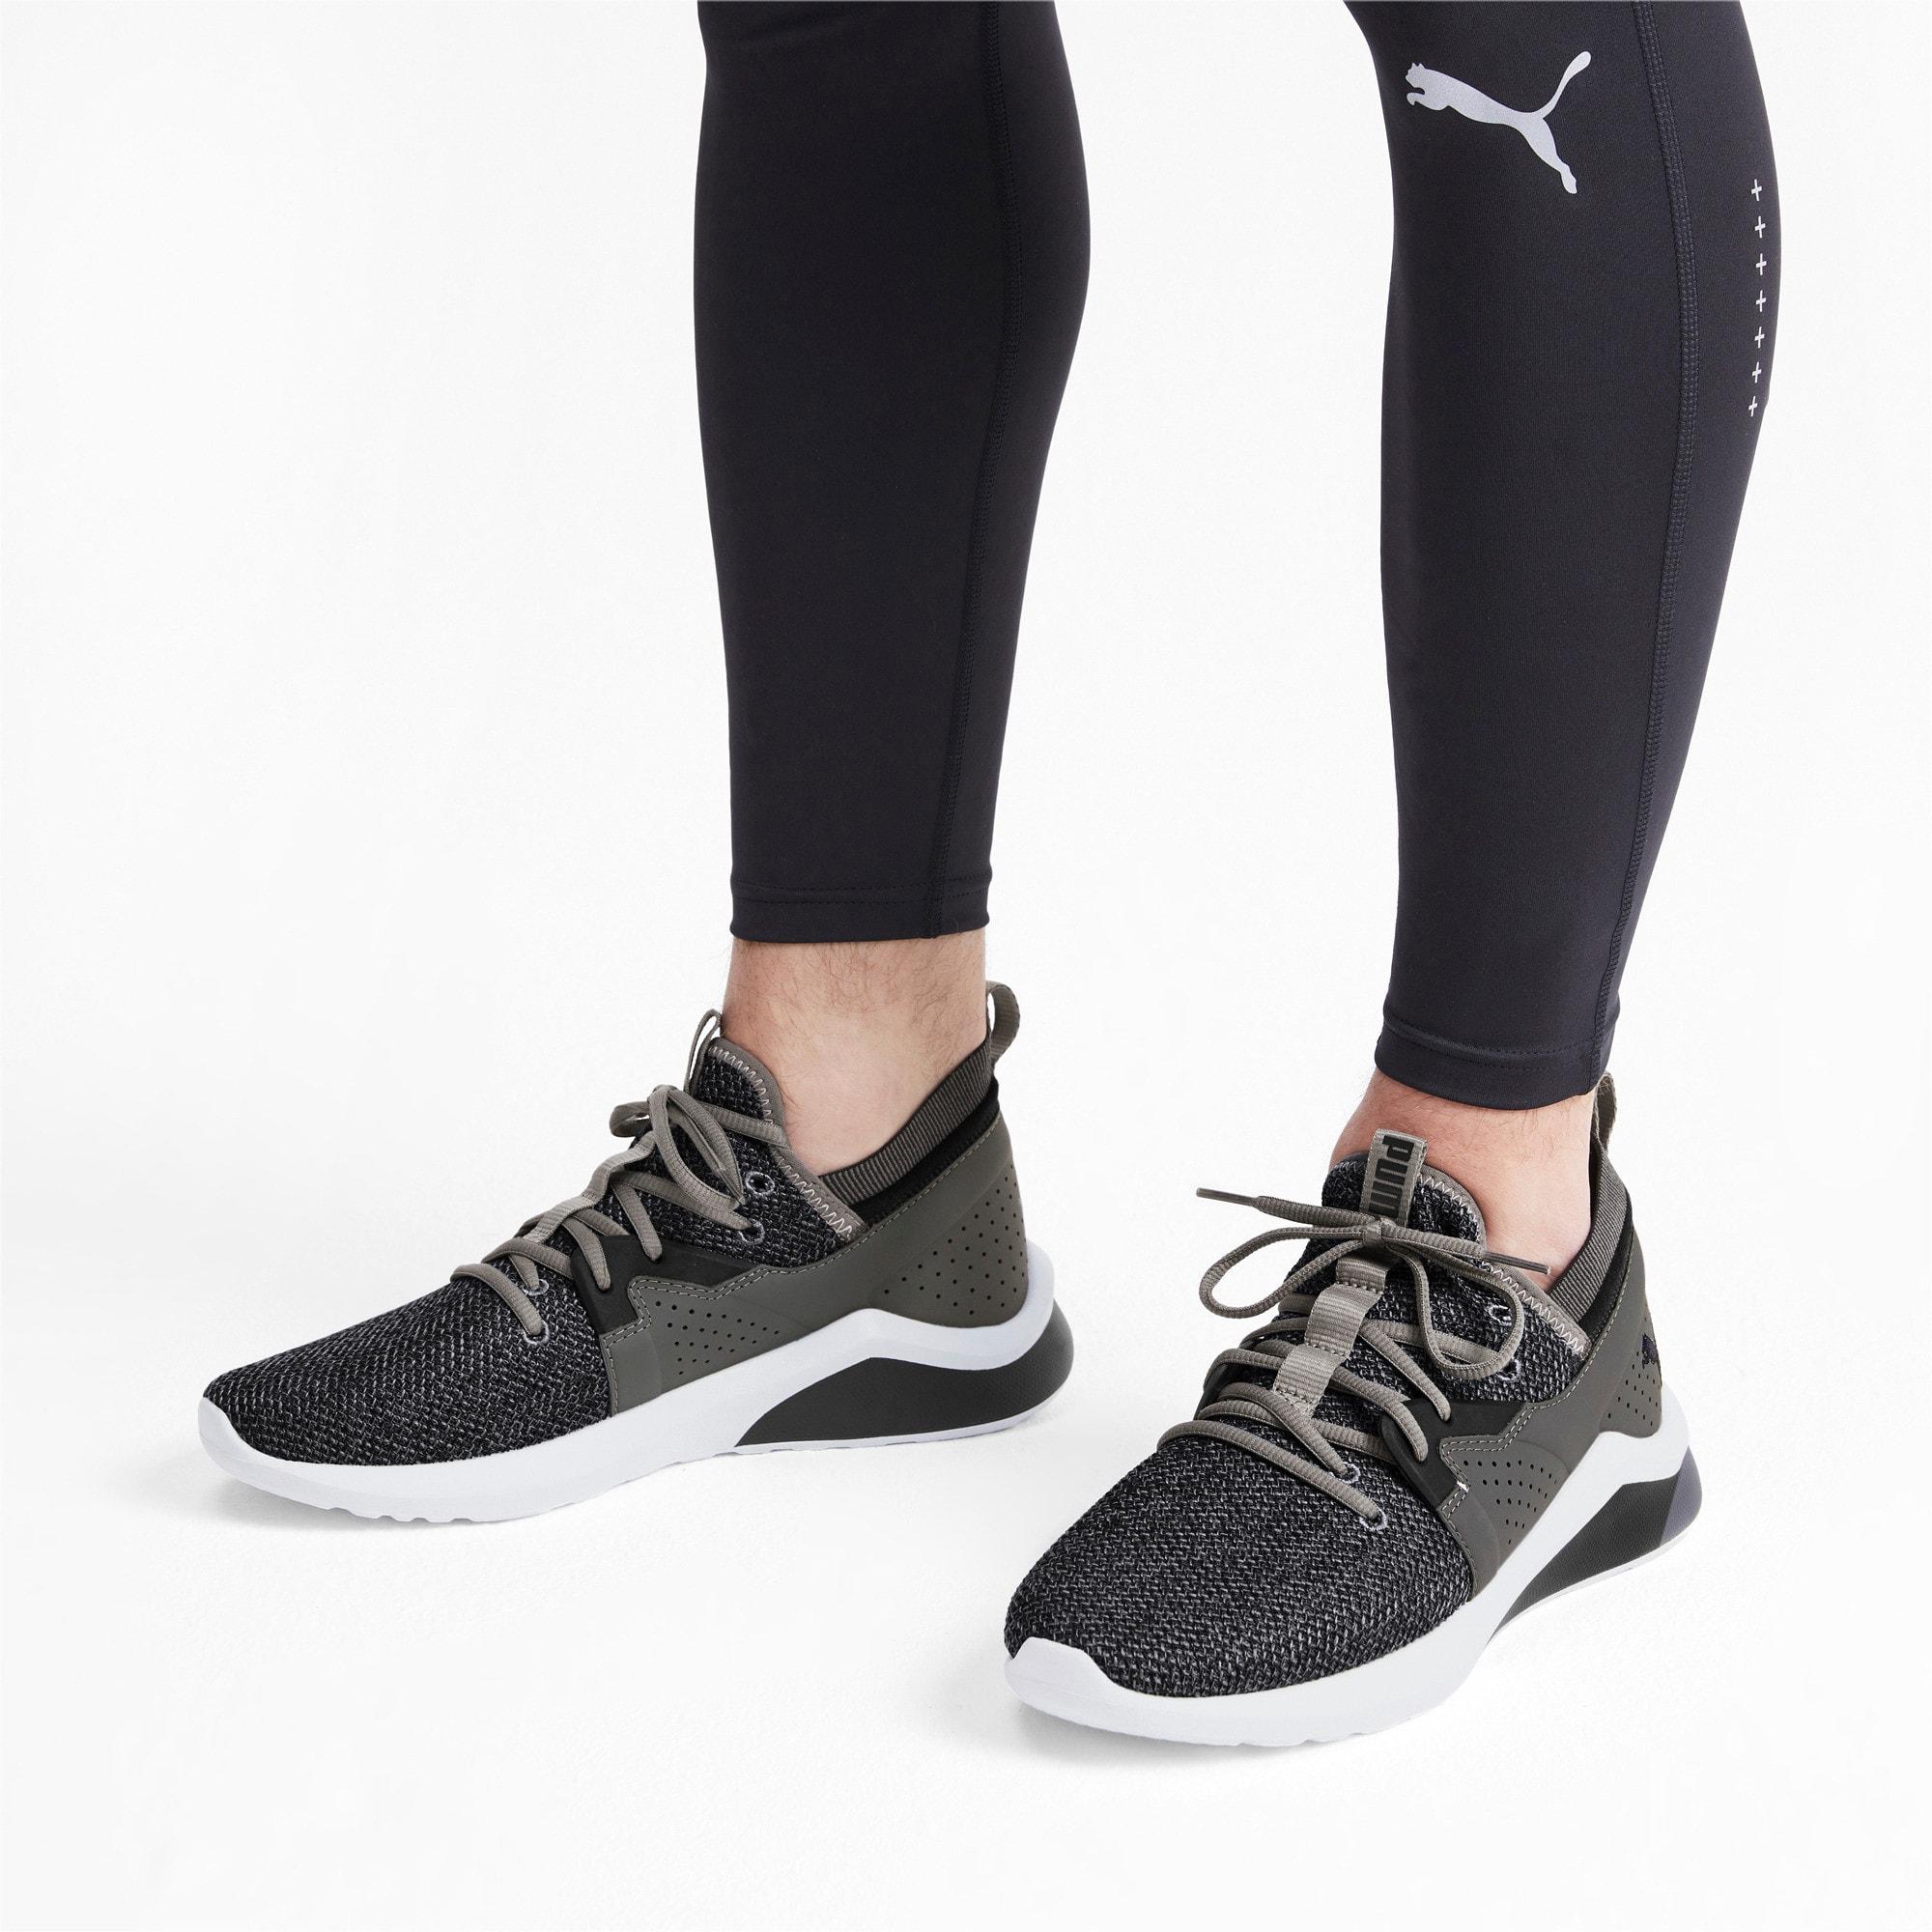 Miniatura 3 de Zapatos deportivos Emergence para hombre, CASTLEROCK-Puma Black, mediano